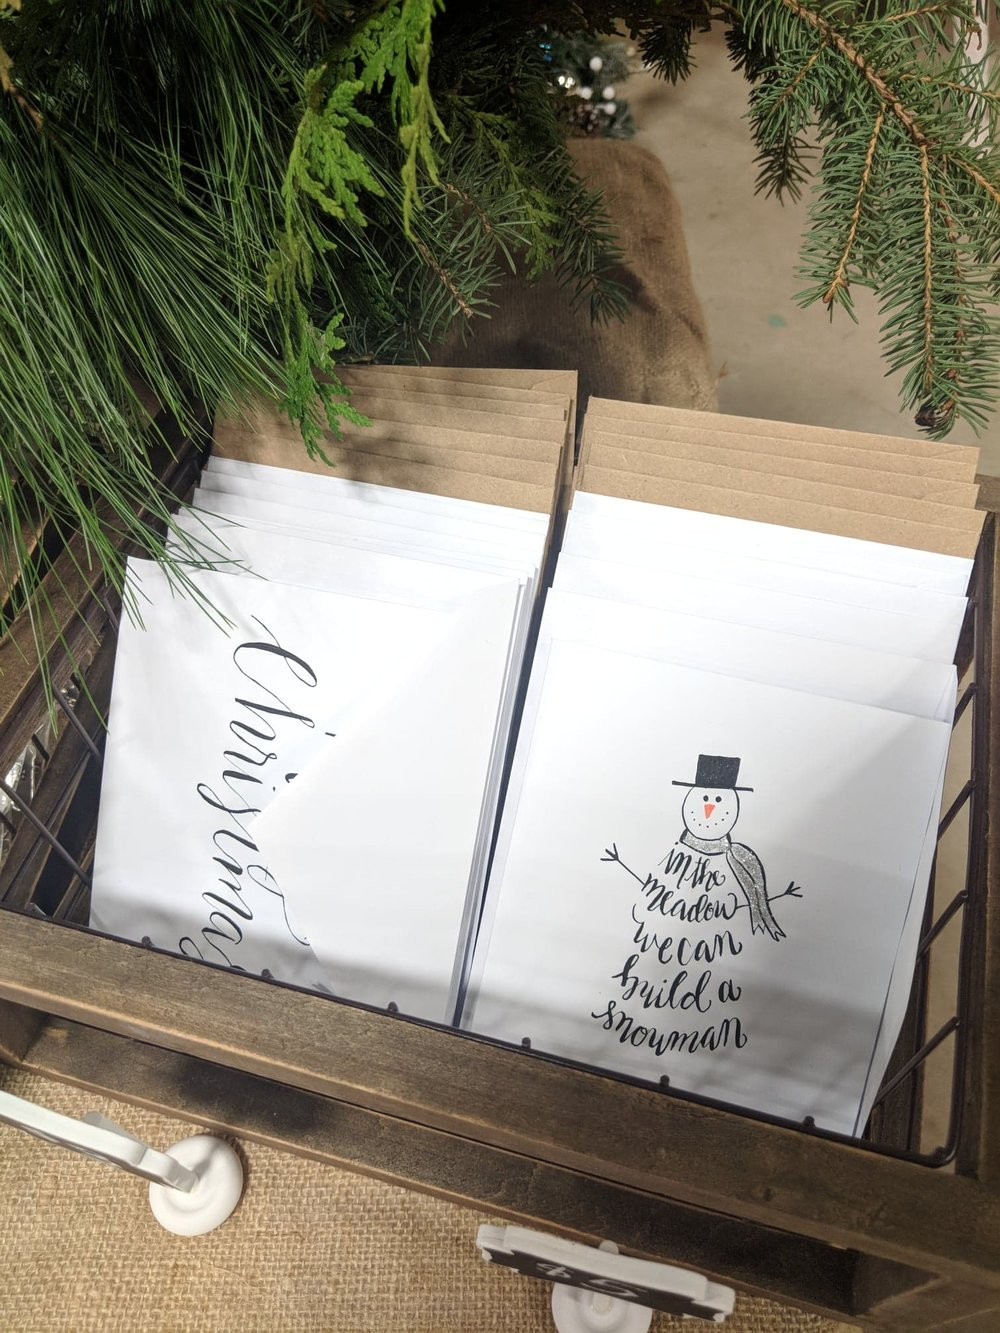 Handmade Christmas cards done by Kaitlyn